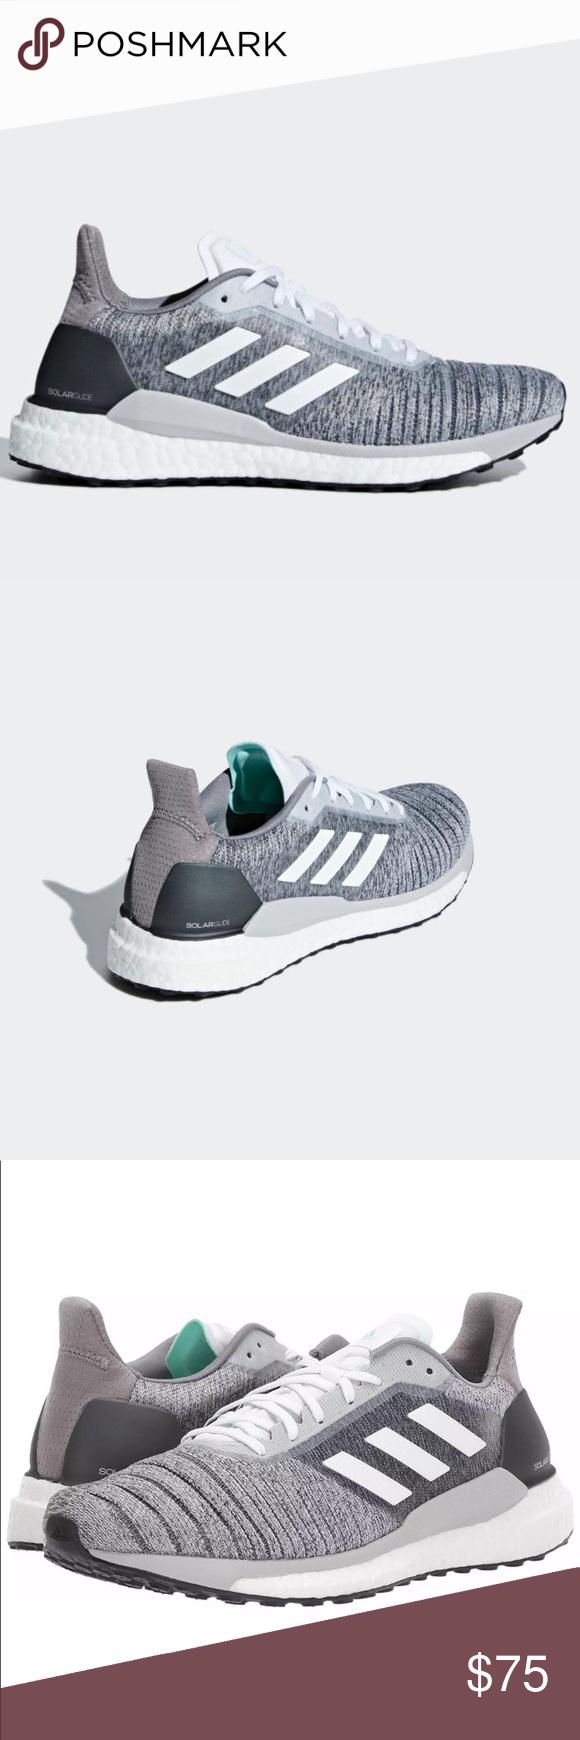 NWT Adidas SuperNova Glide Men's Running Shoe NWT